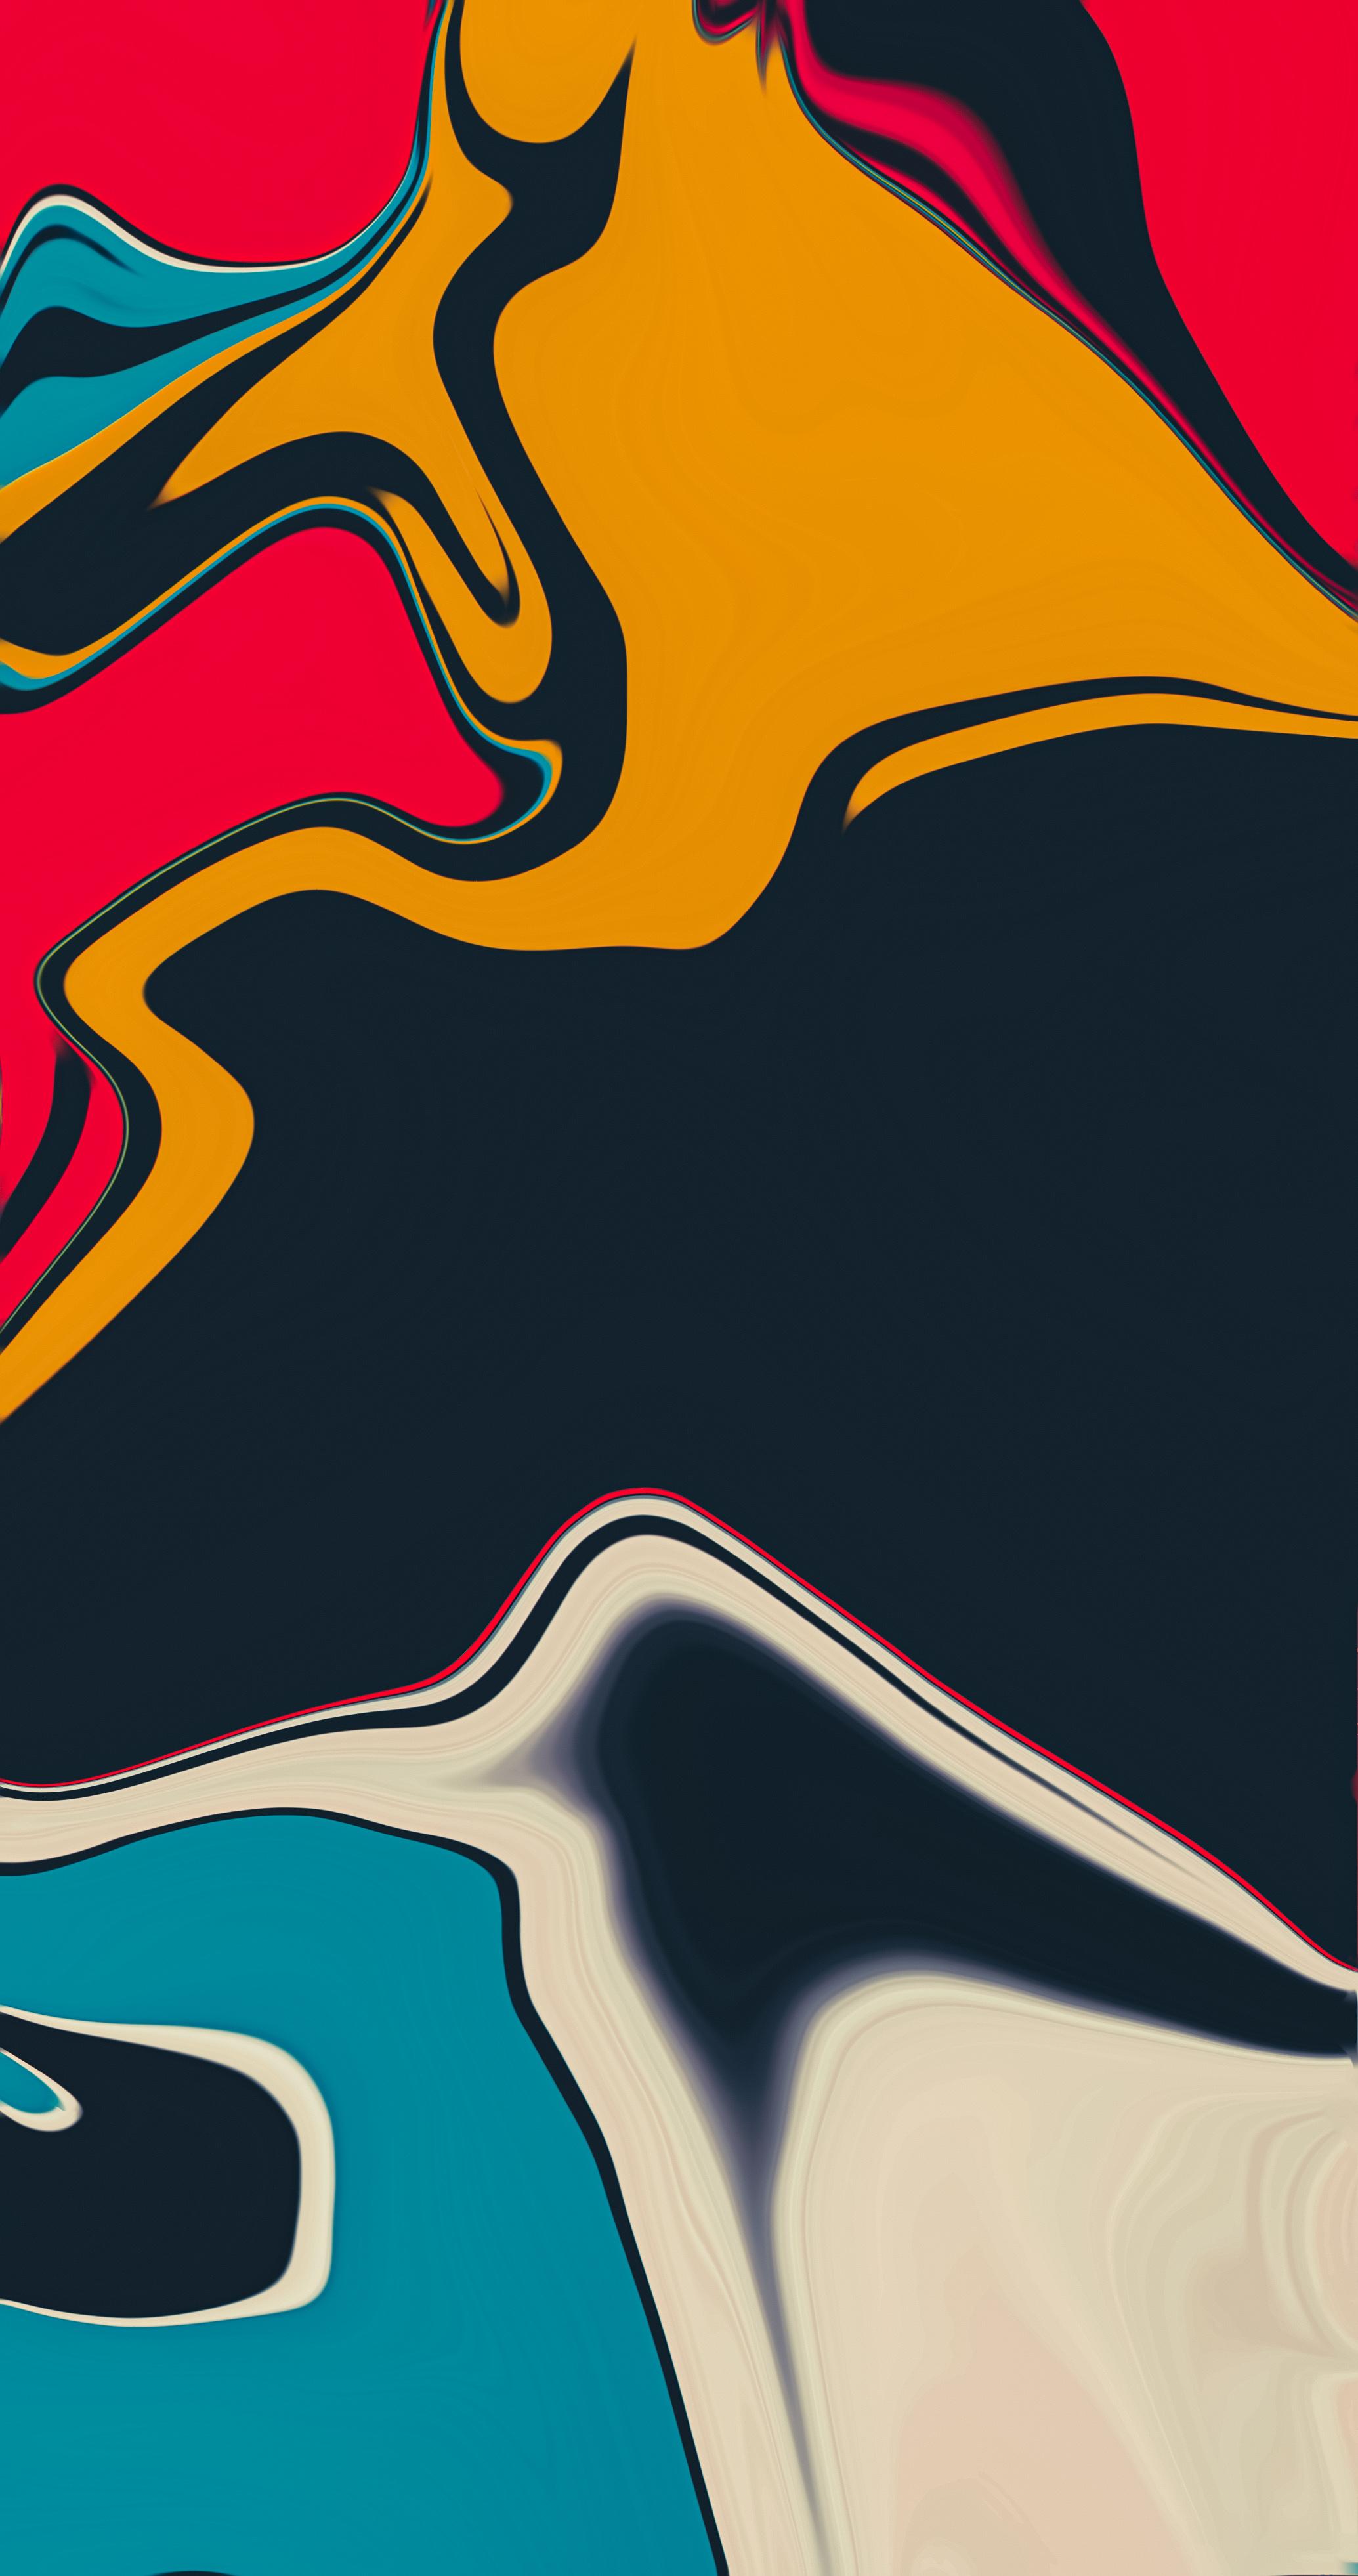 abstract iphone wallpaper idownloadblog saumil8200 color-fun